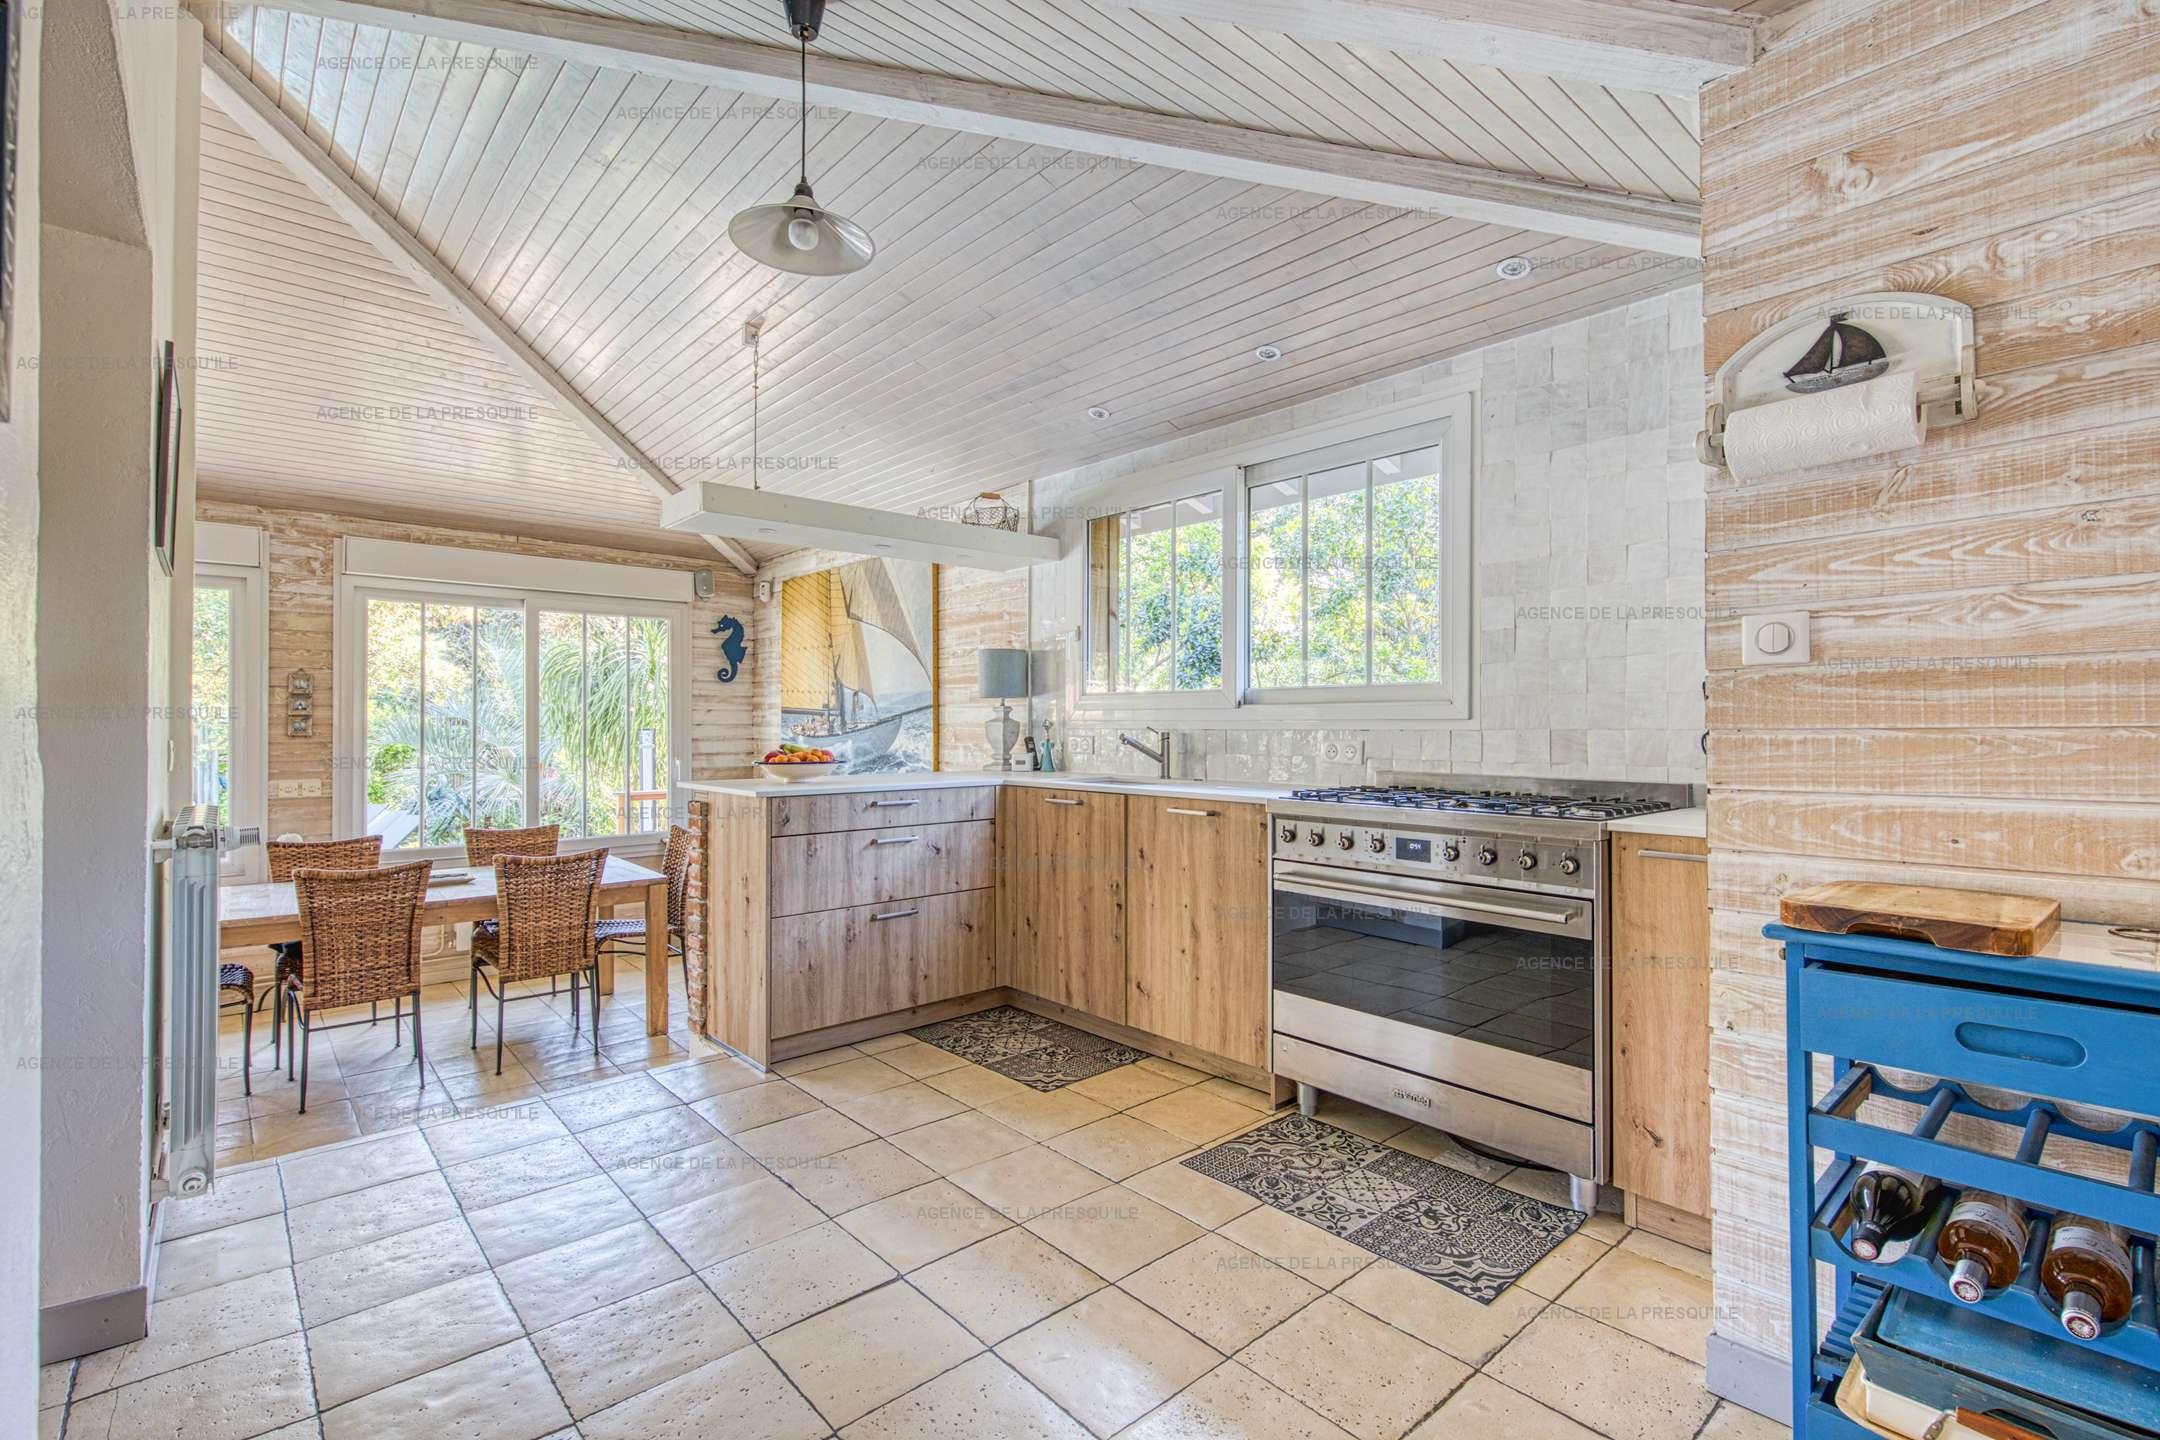 Location: Charmante villa avec piscine entre bassin et océan 6